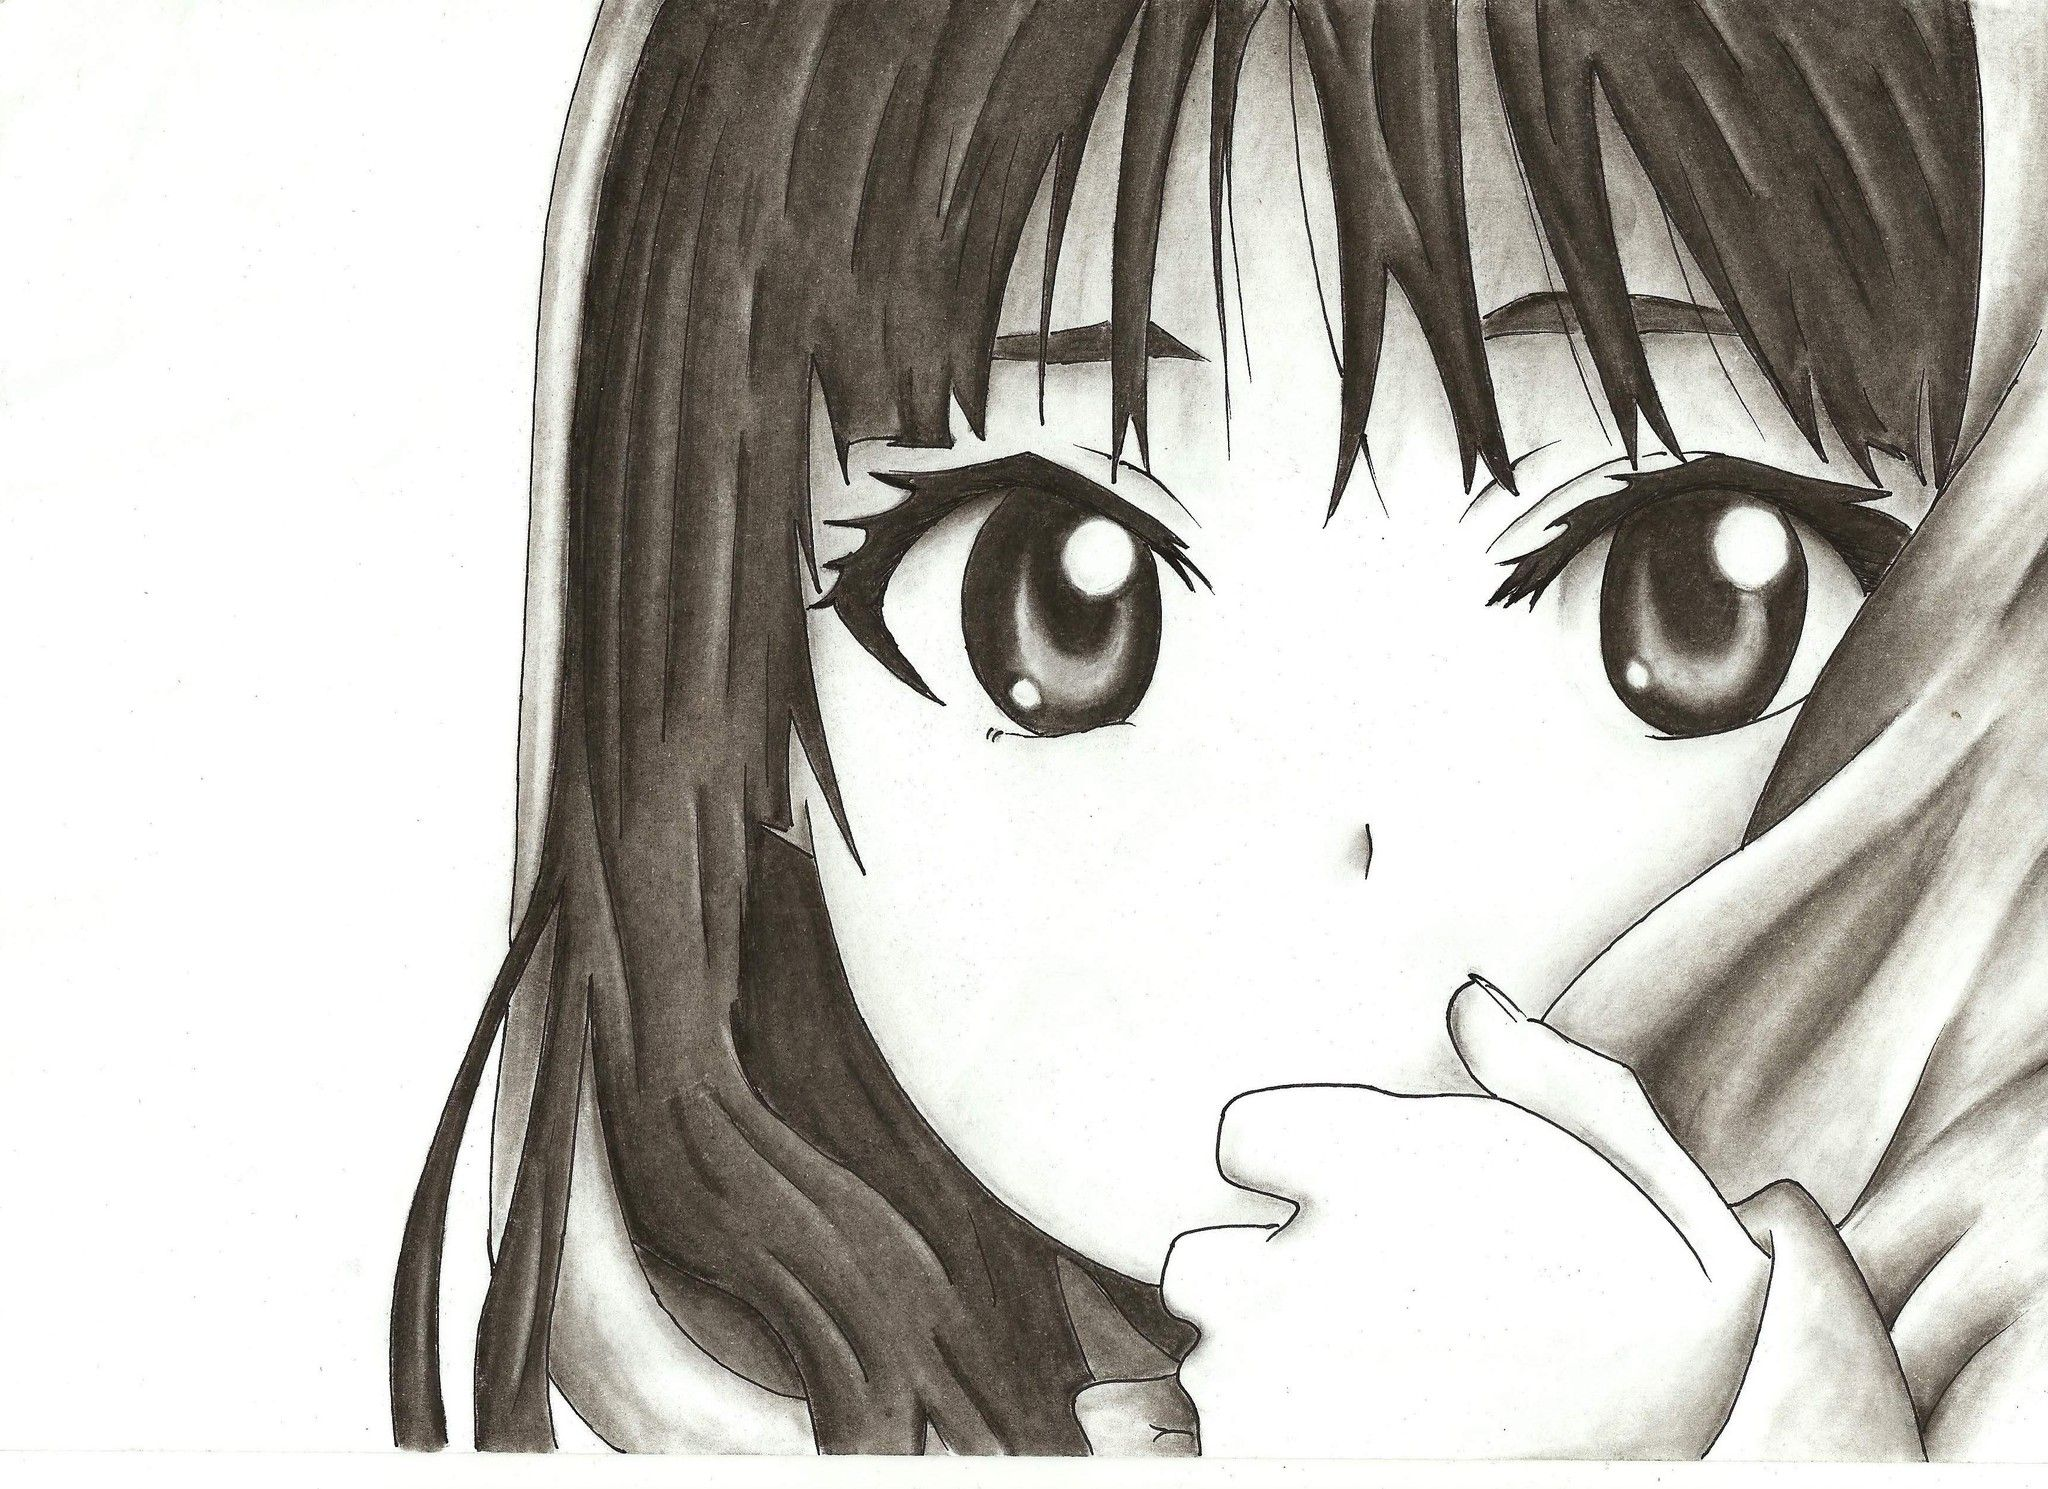 Resultado de imagen para anime dibujos | dibujos | Pinterest ...